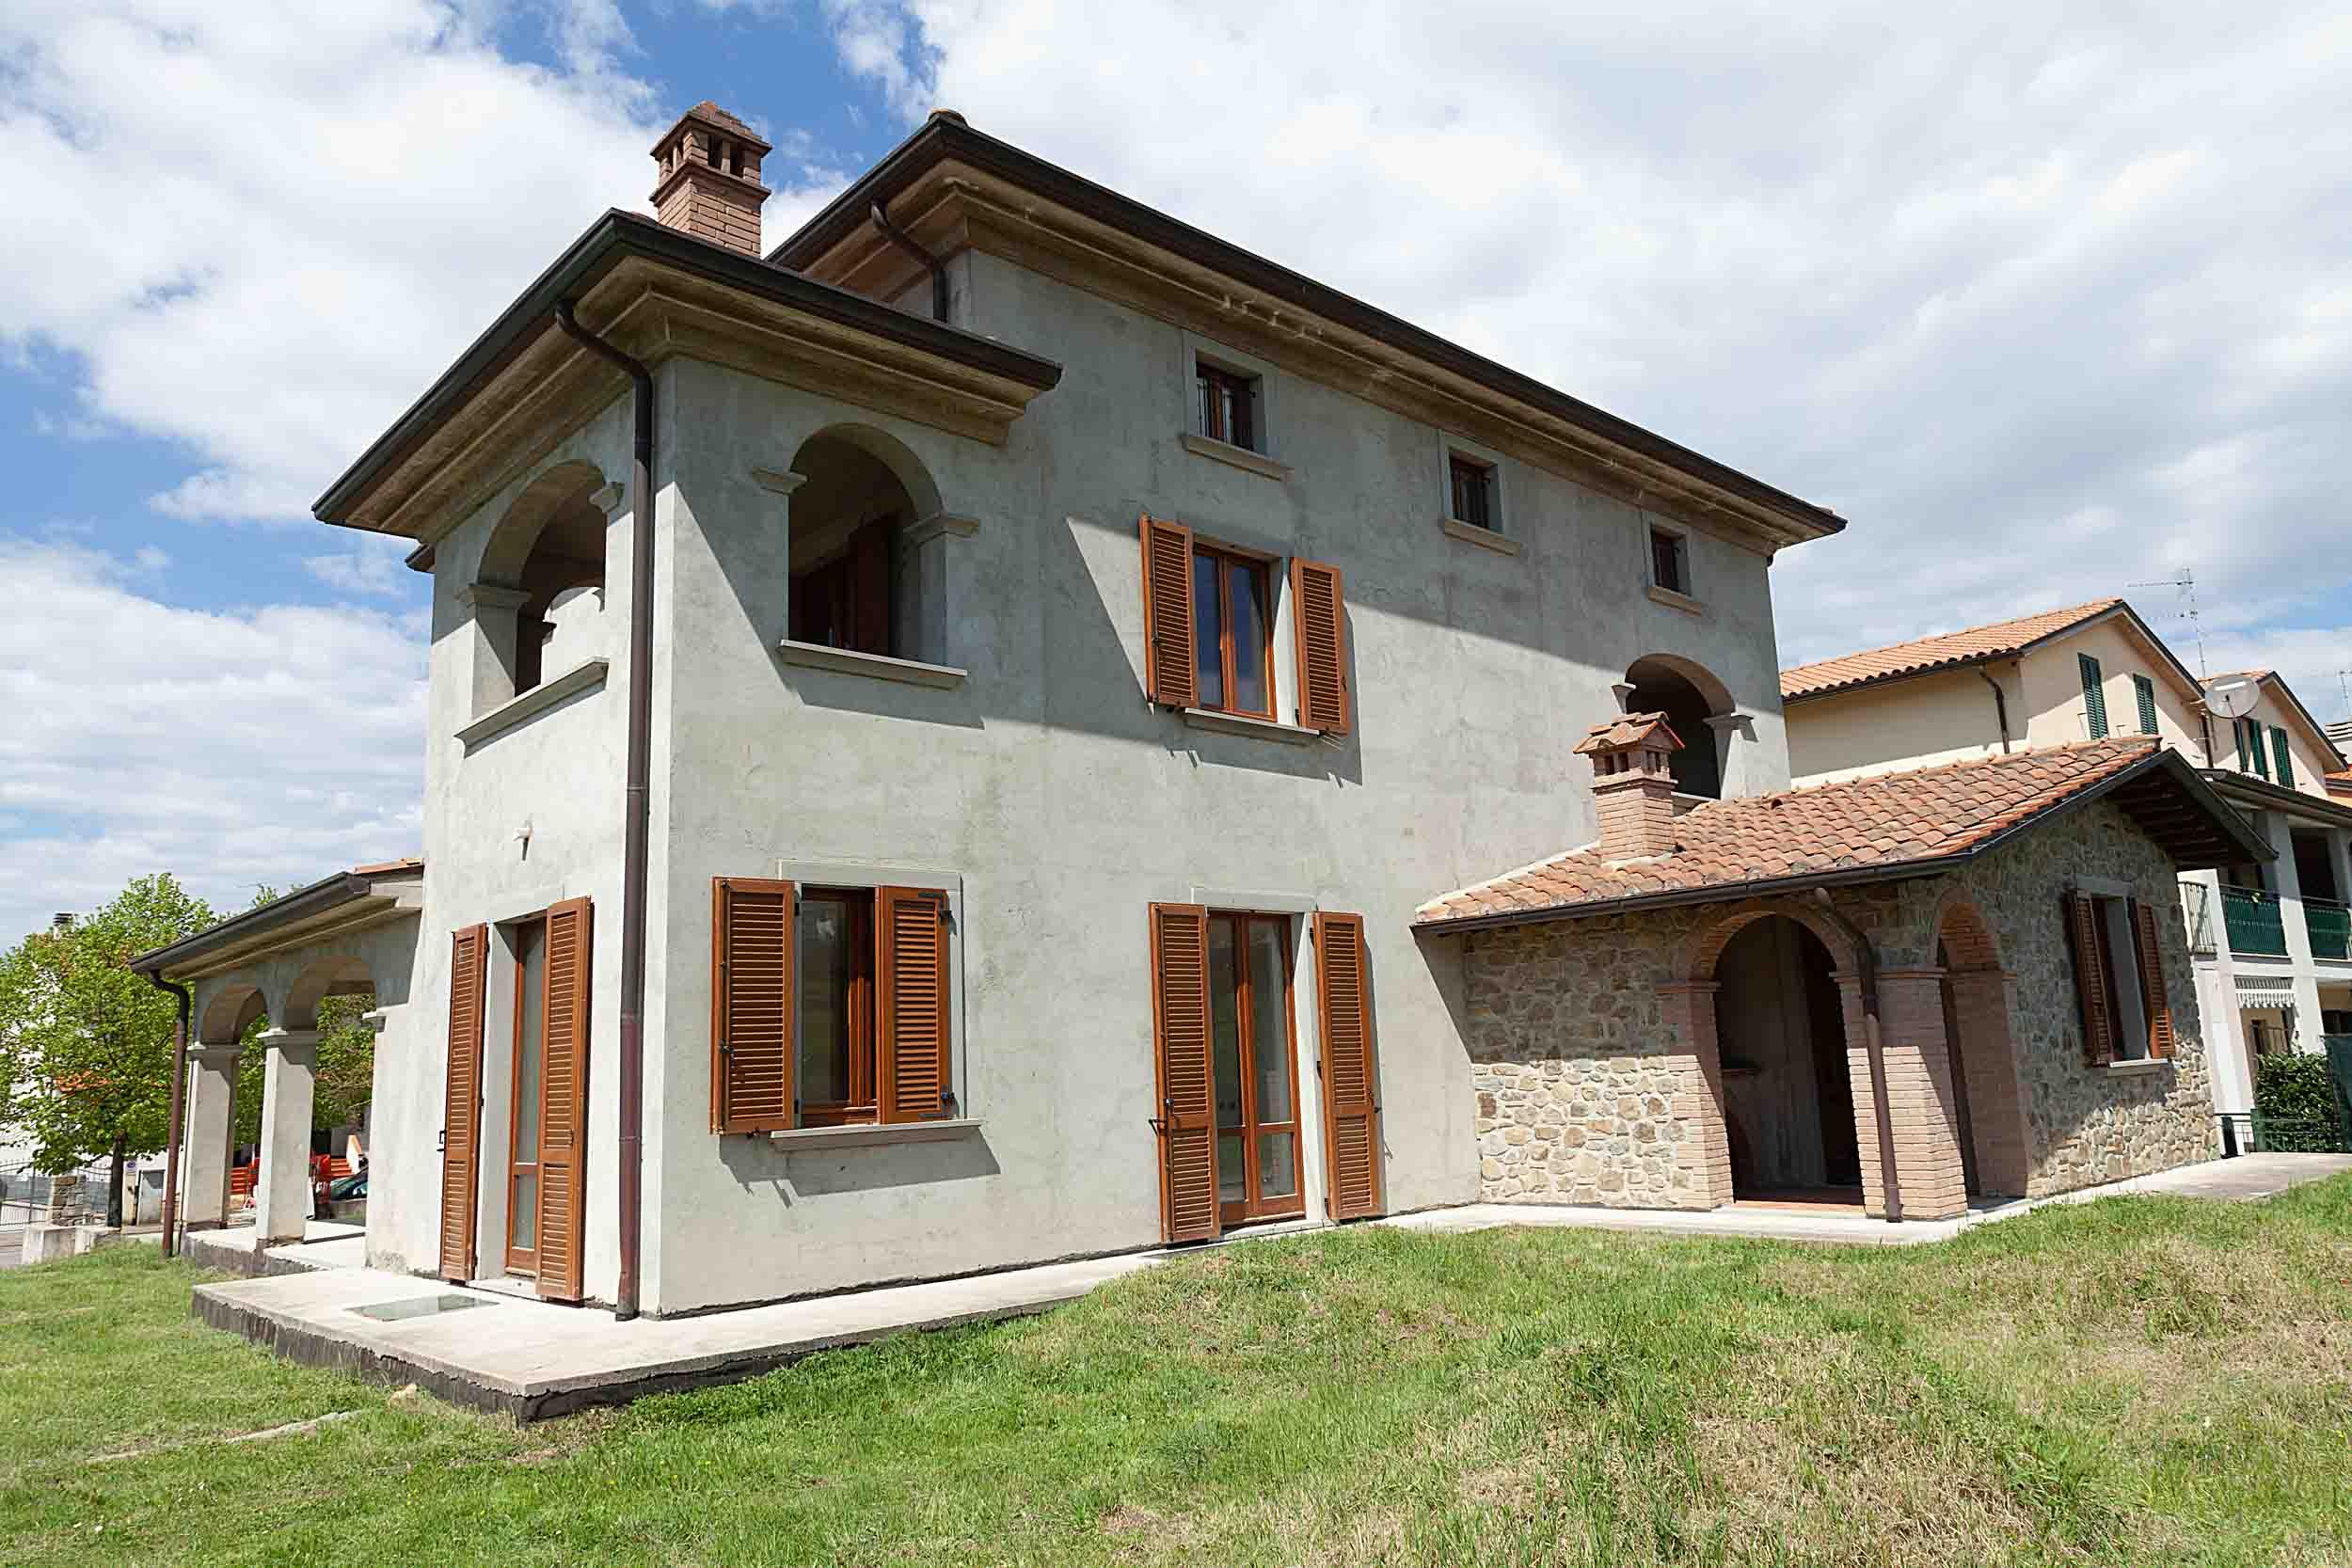 Tregozzano vendesi villa singola (5)